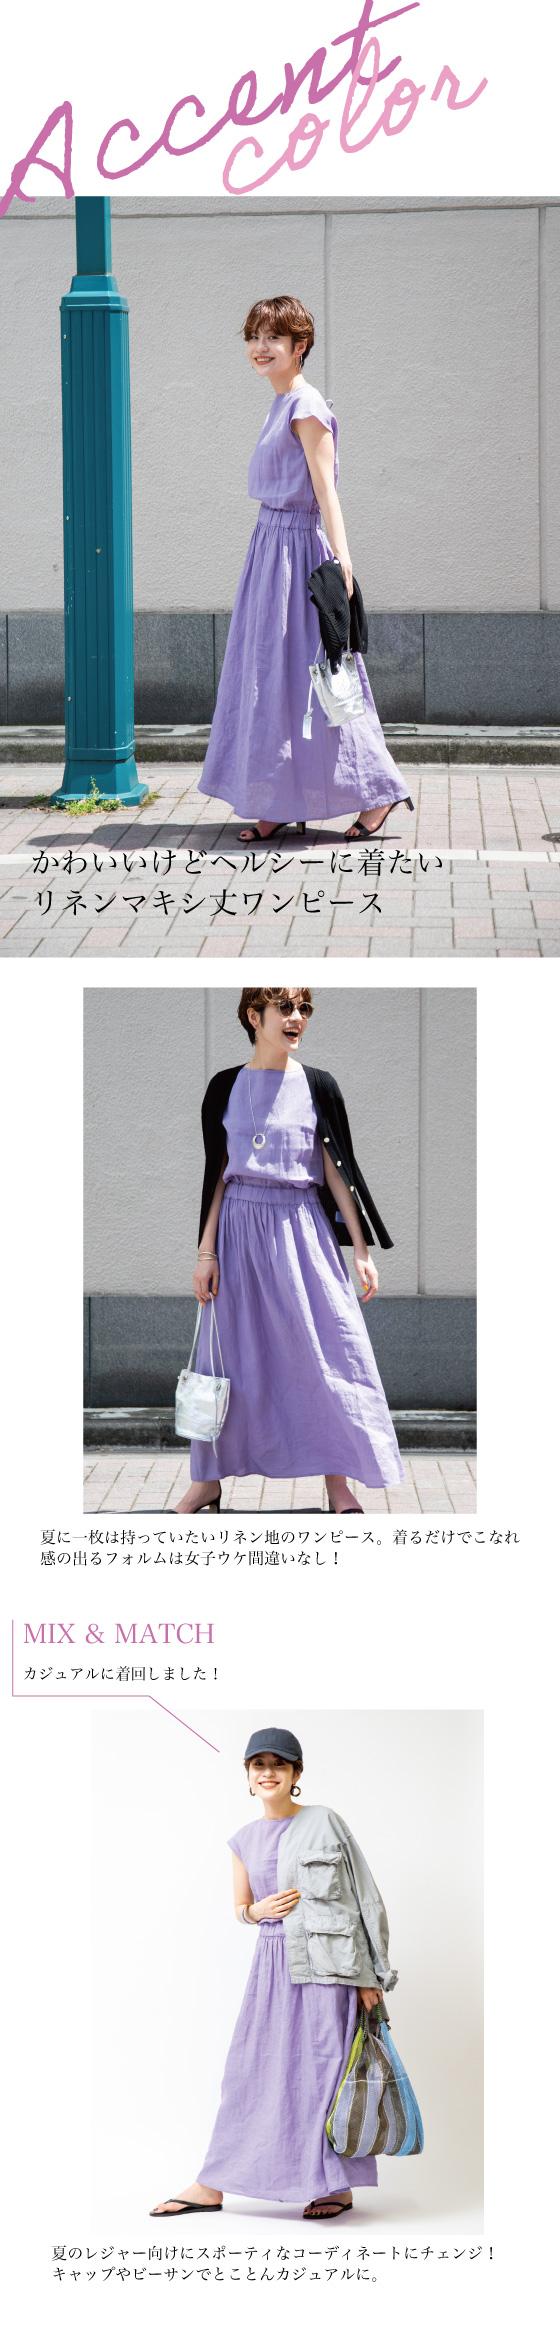 news_30_5gatu_dress03a